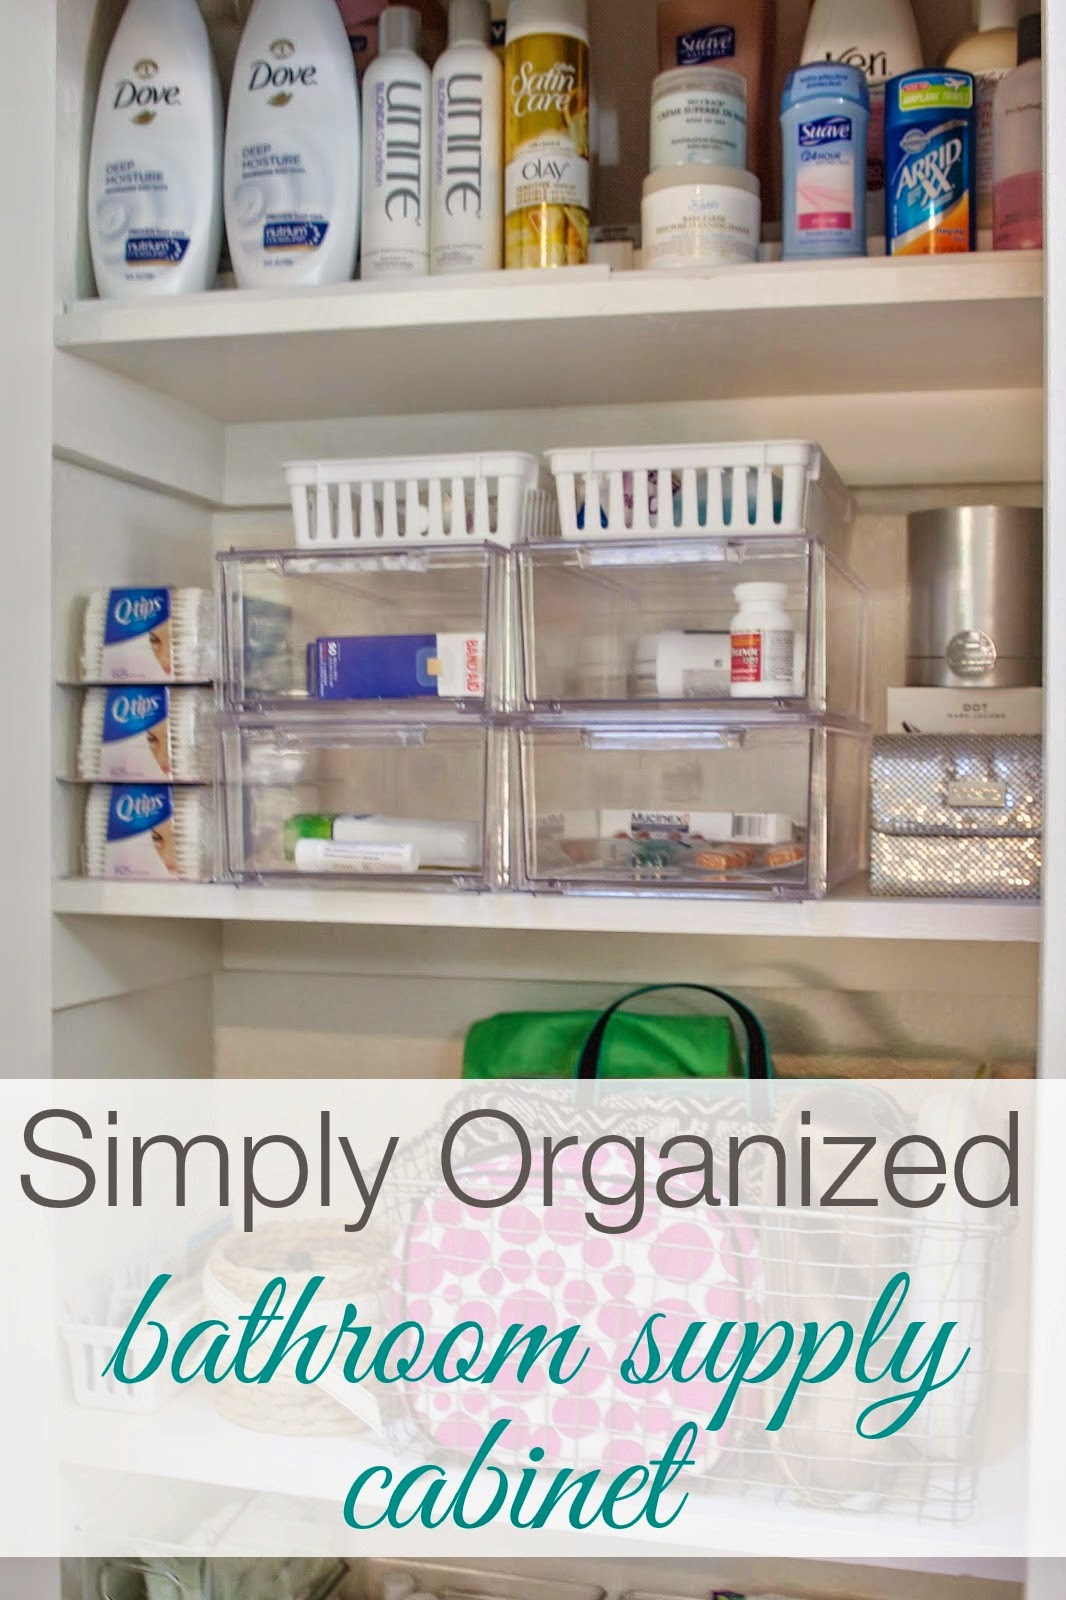 professional kitchen supplies modern design organized bathroom supply cabinet - simply